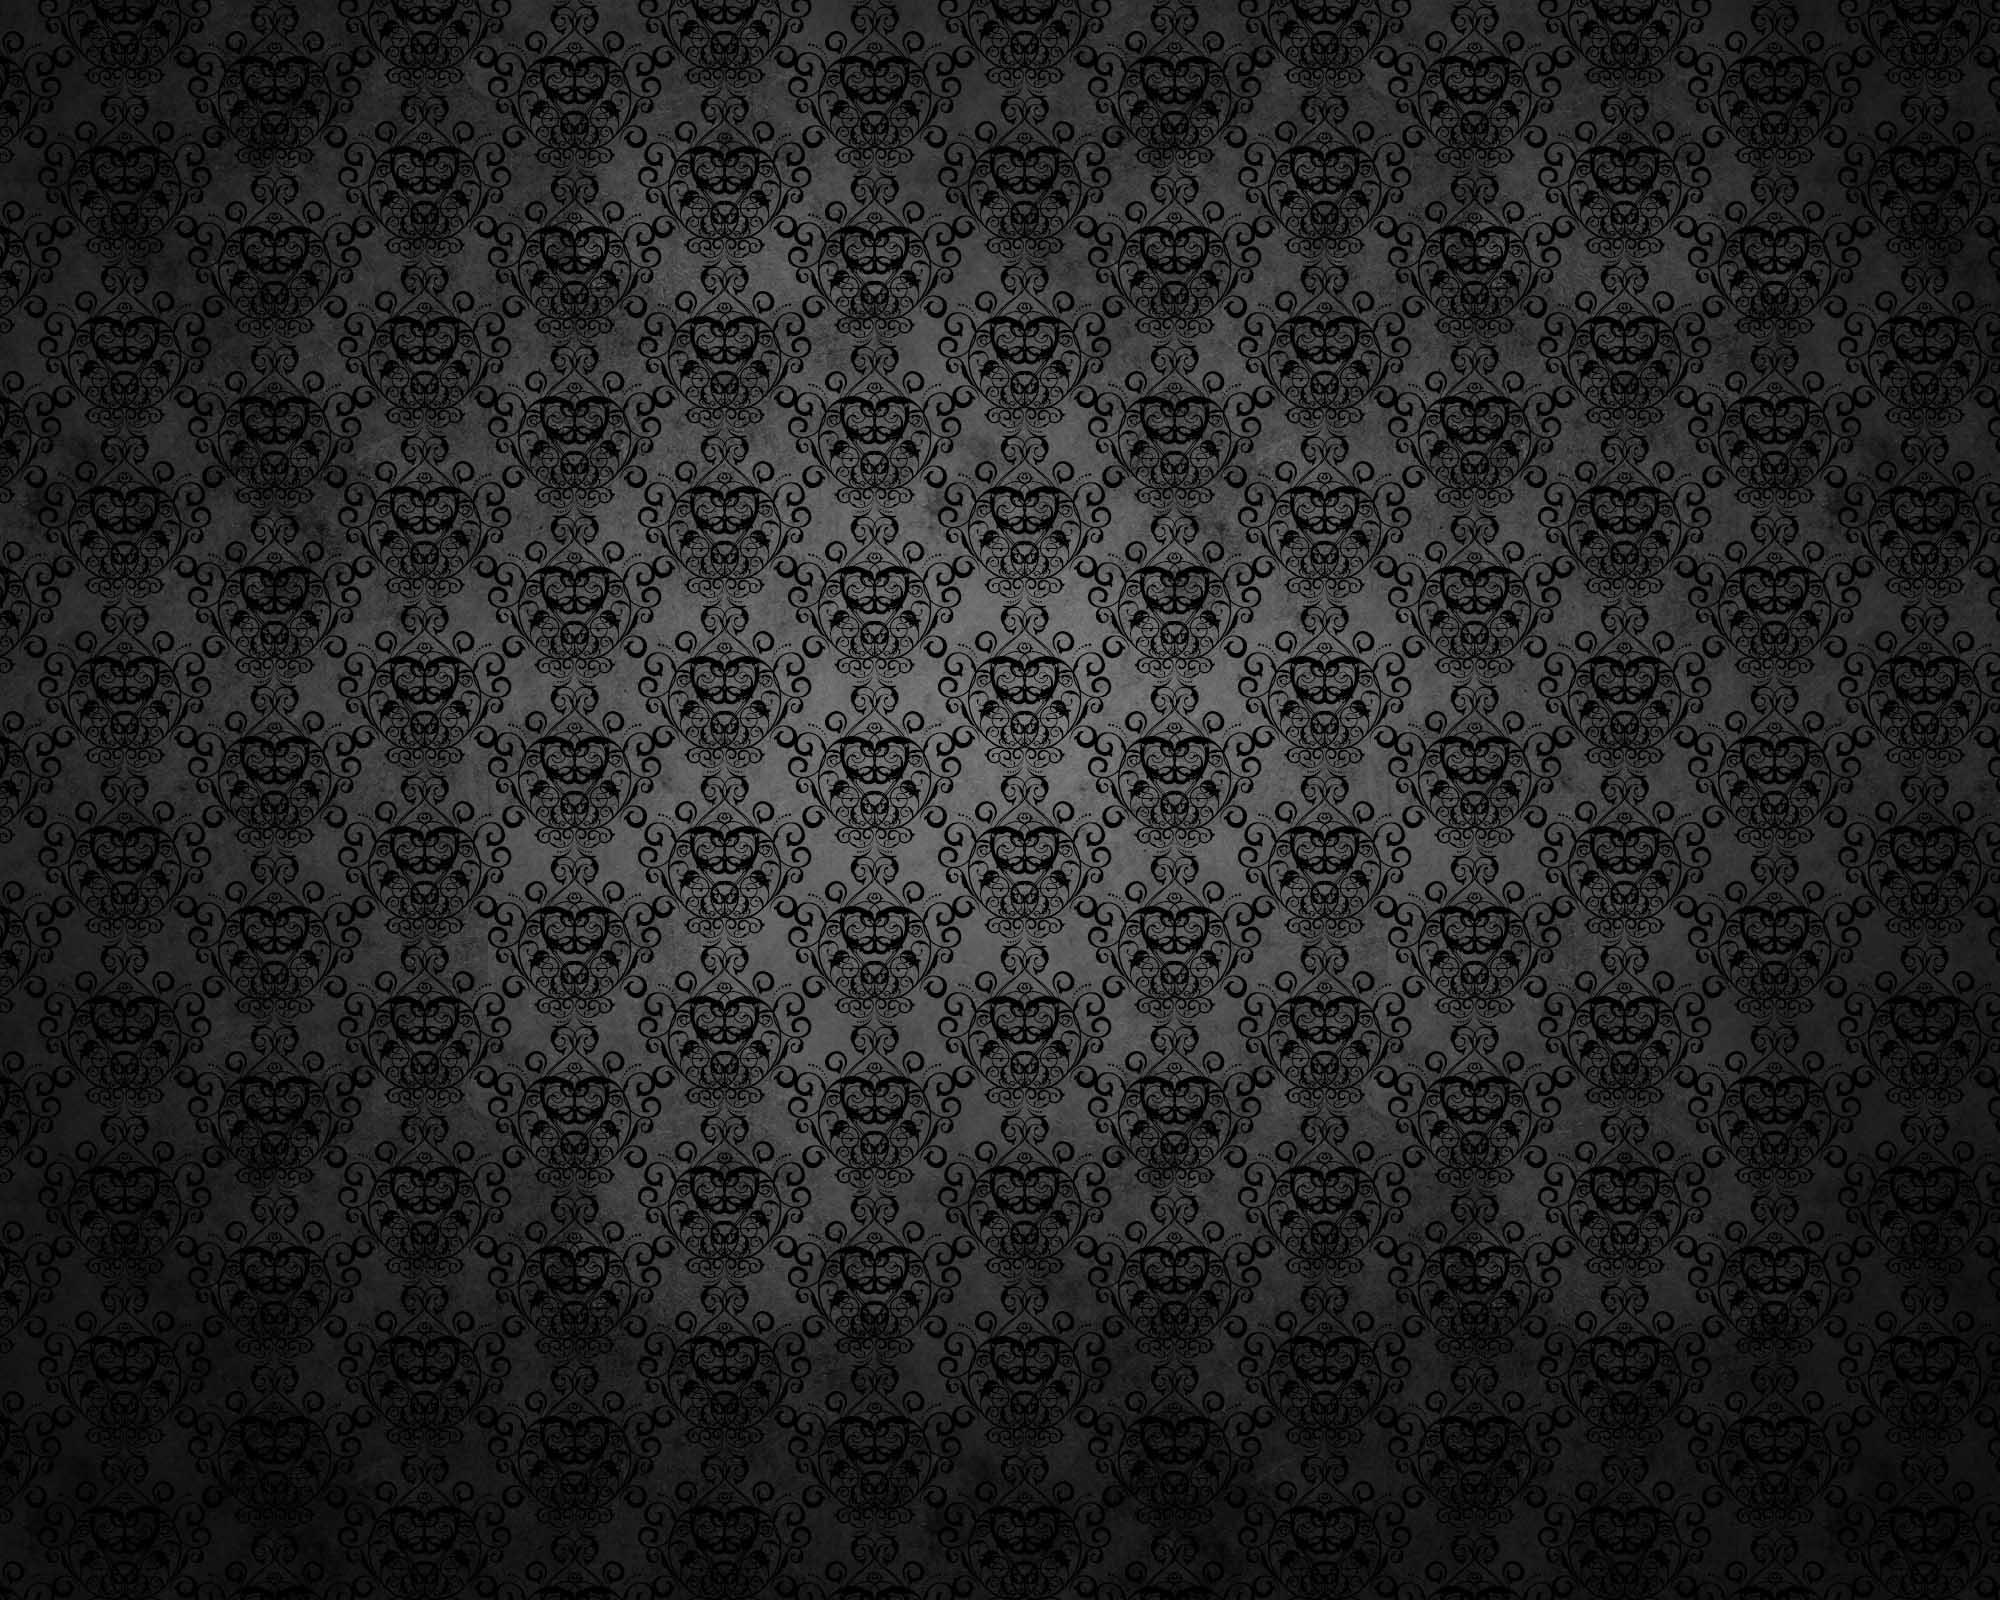 bg-vintage-wallpaper-black